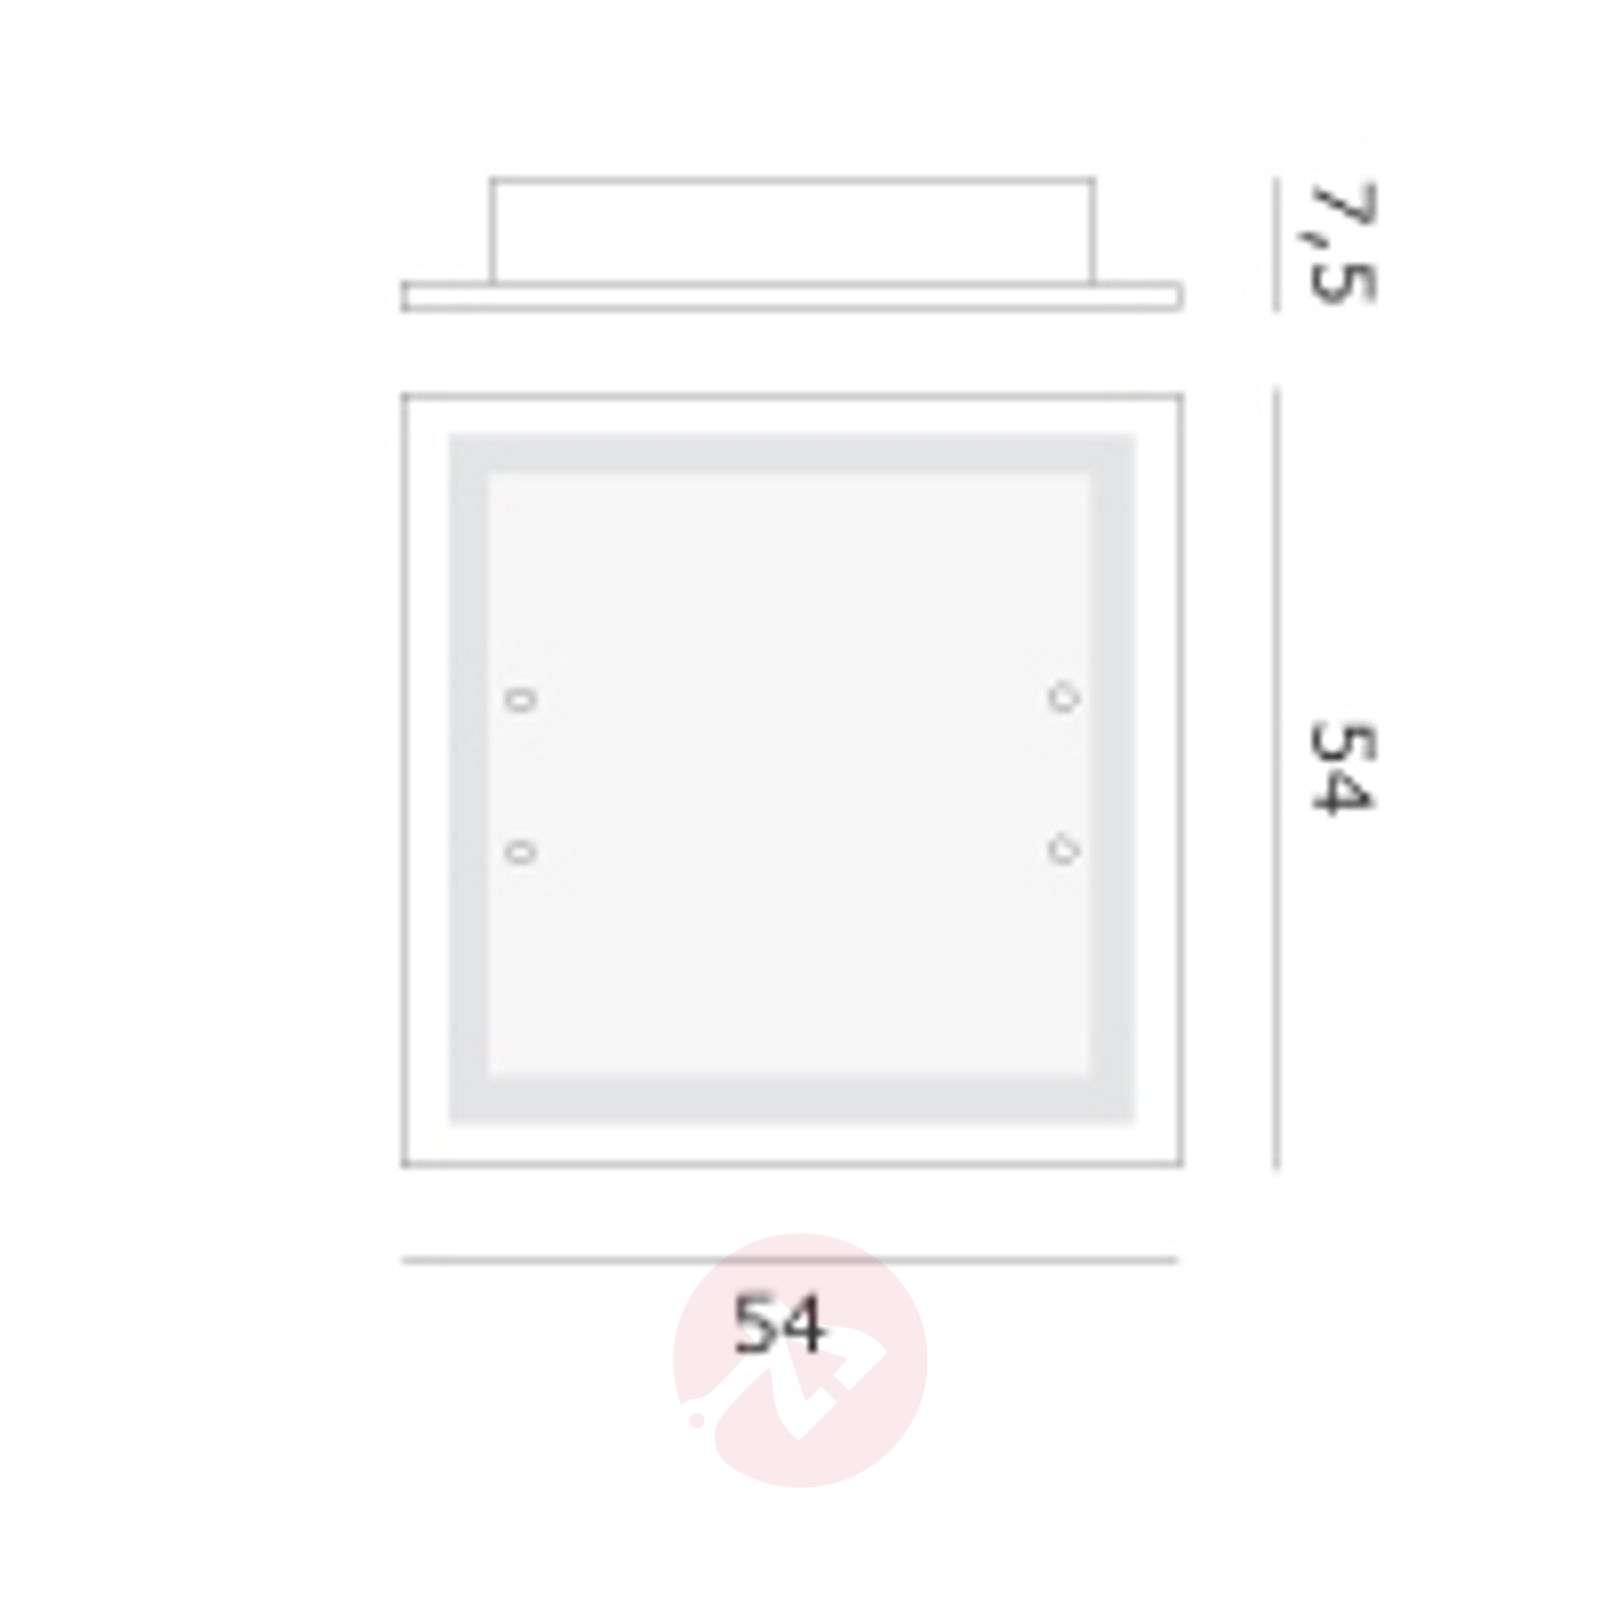 Suuri design-seinä tai kattovalaisin Quadra-2502325-01